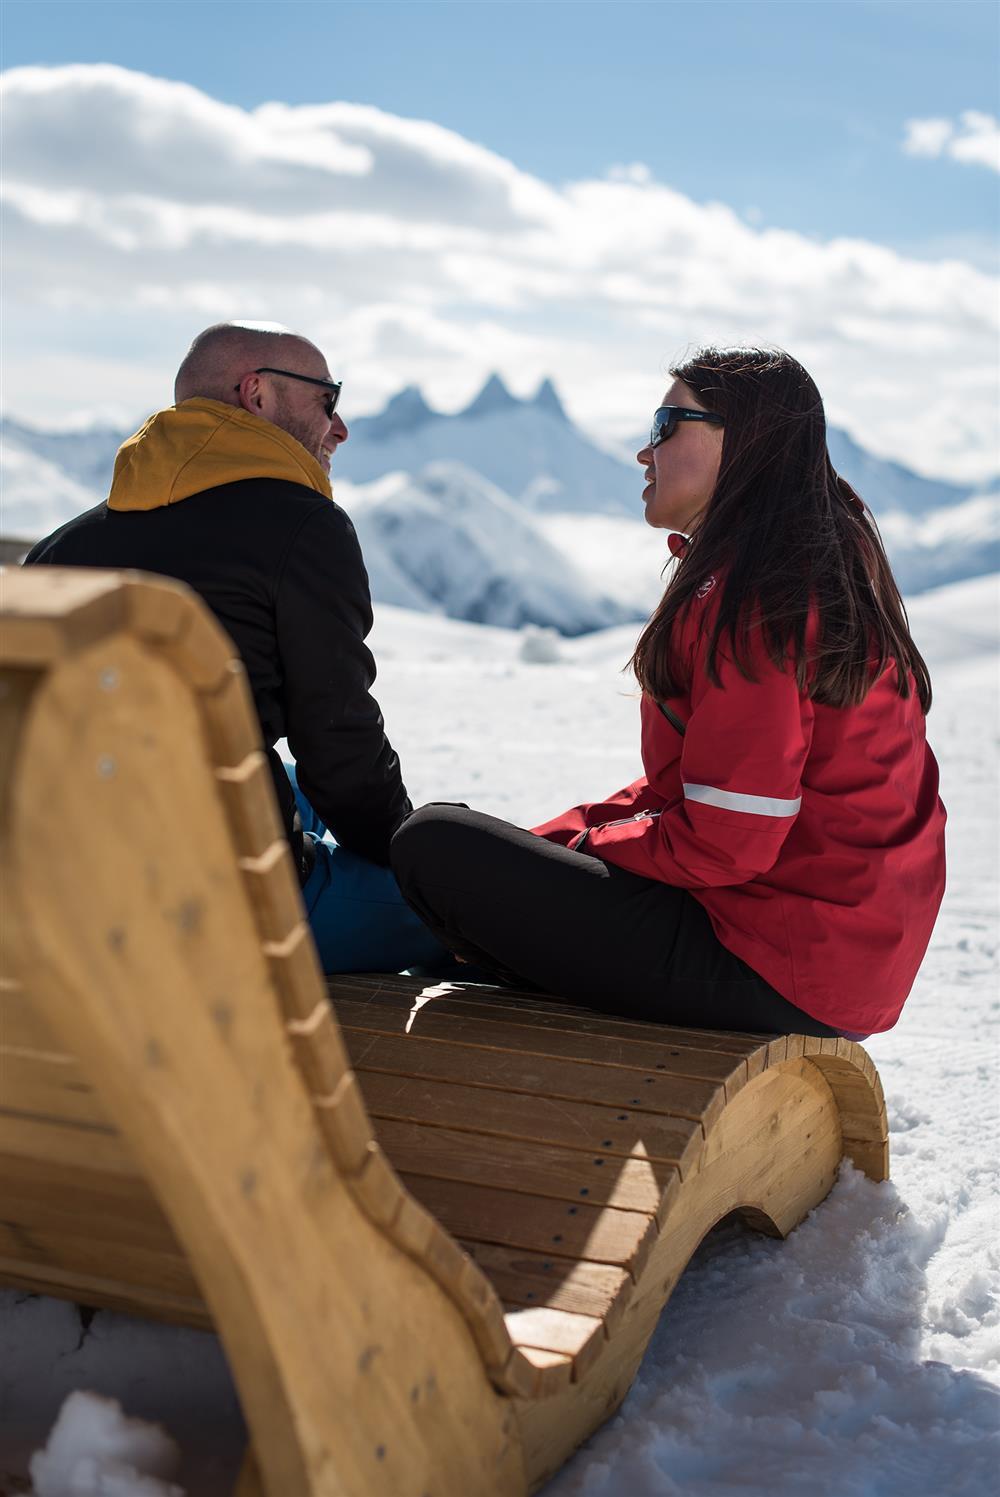 Fauteuil relaxation @SnowpyMountain @laToussuire © Alban Pernet